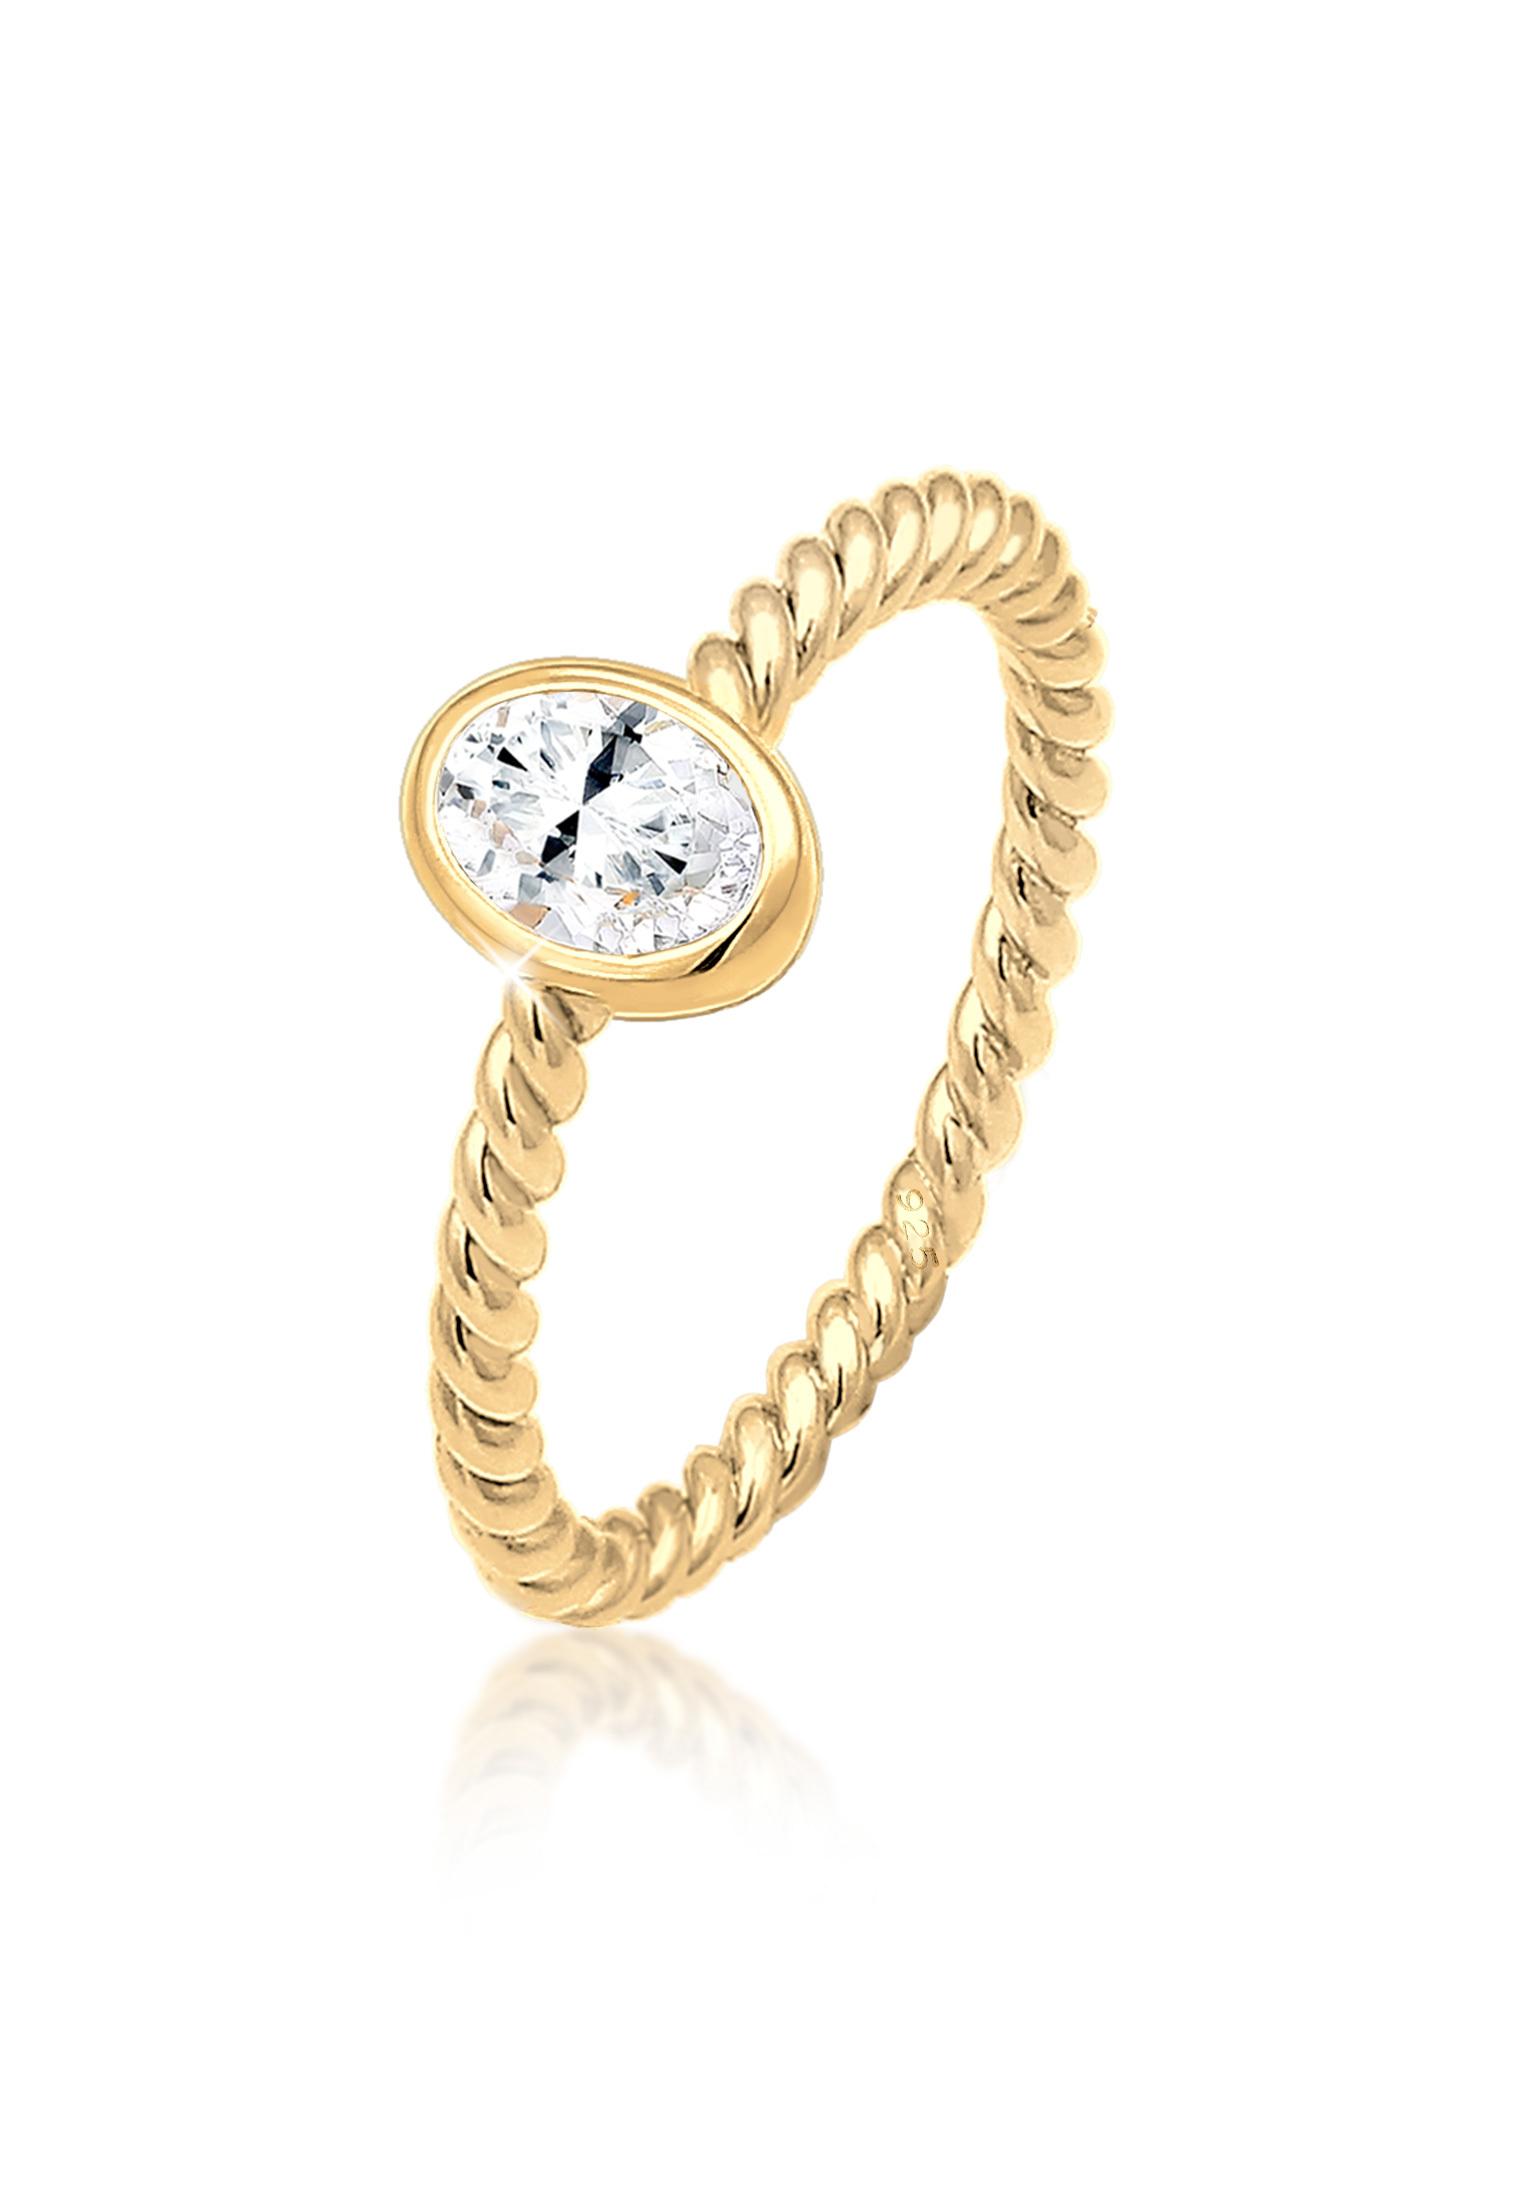 Verlobungsring | Topas ( Weiß ) | 925 Sterling Silber vergoldet